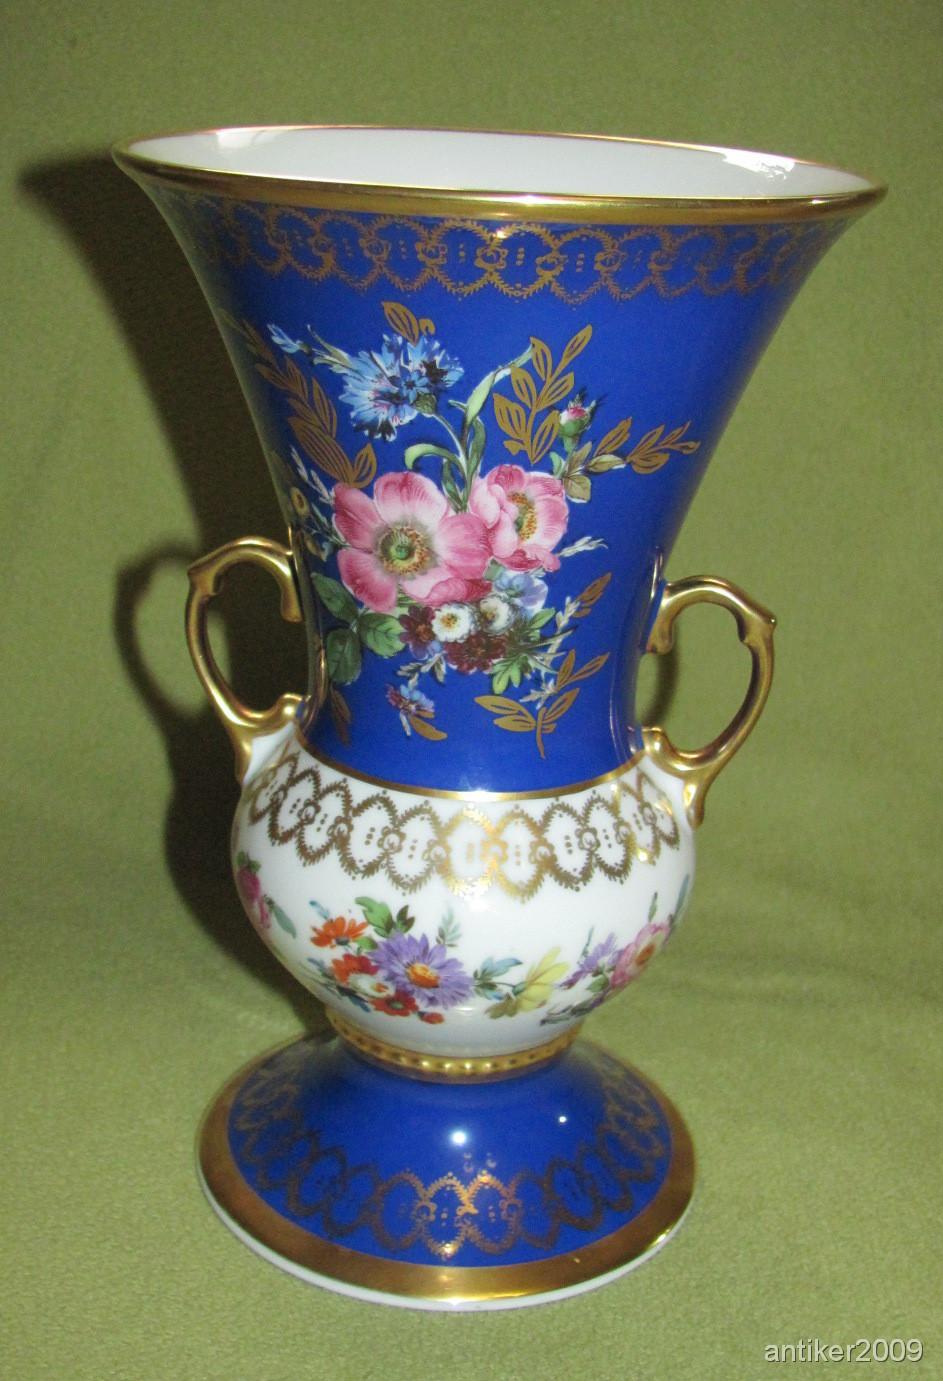 rw bavaria porzellan vase blau gold blumendekor ebay. Black Bedroom Furniture Sets. Home Design Ideas